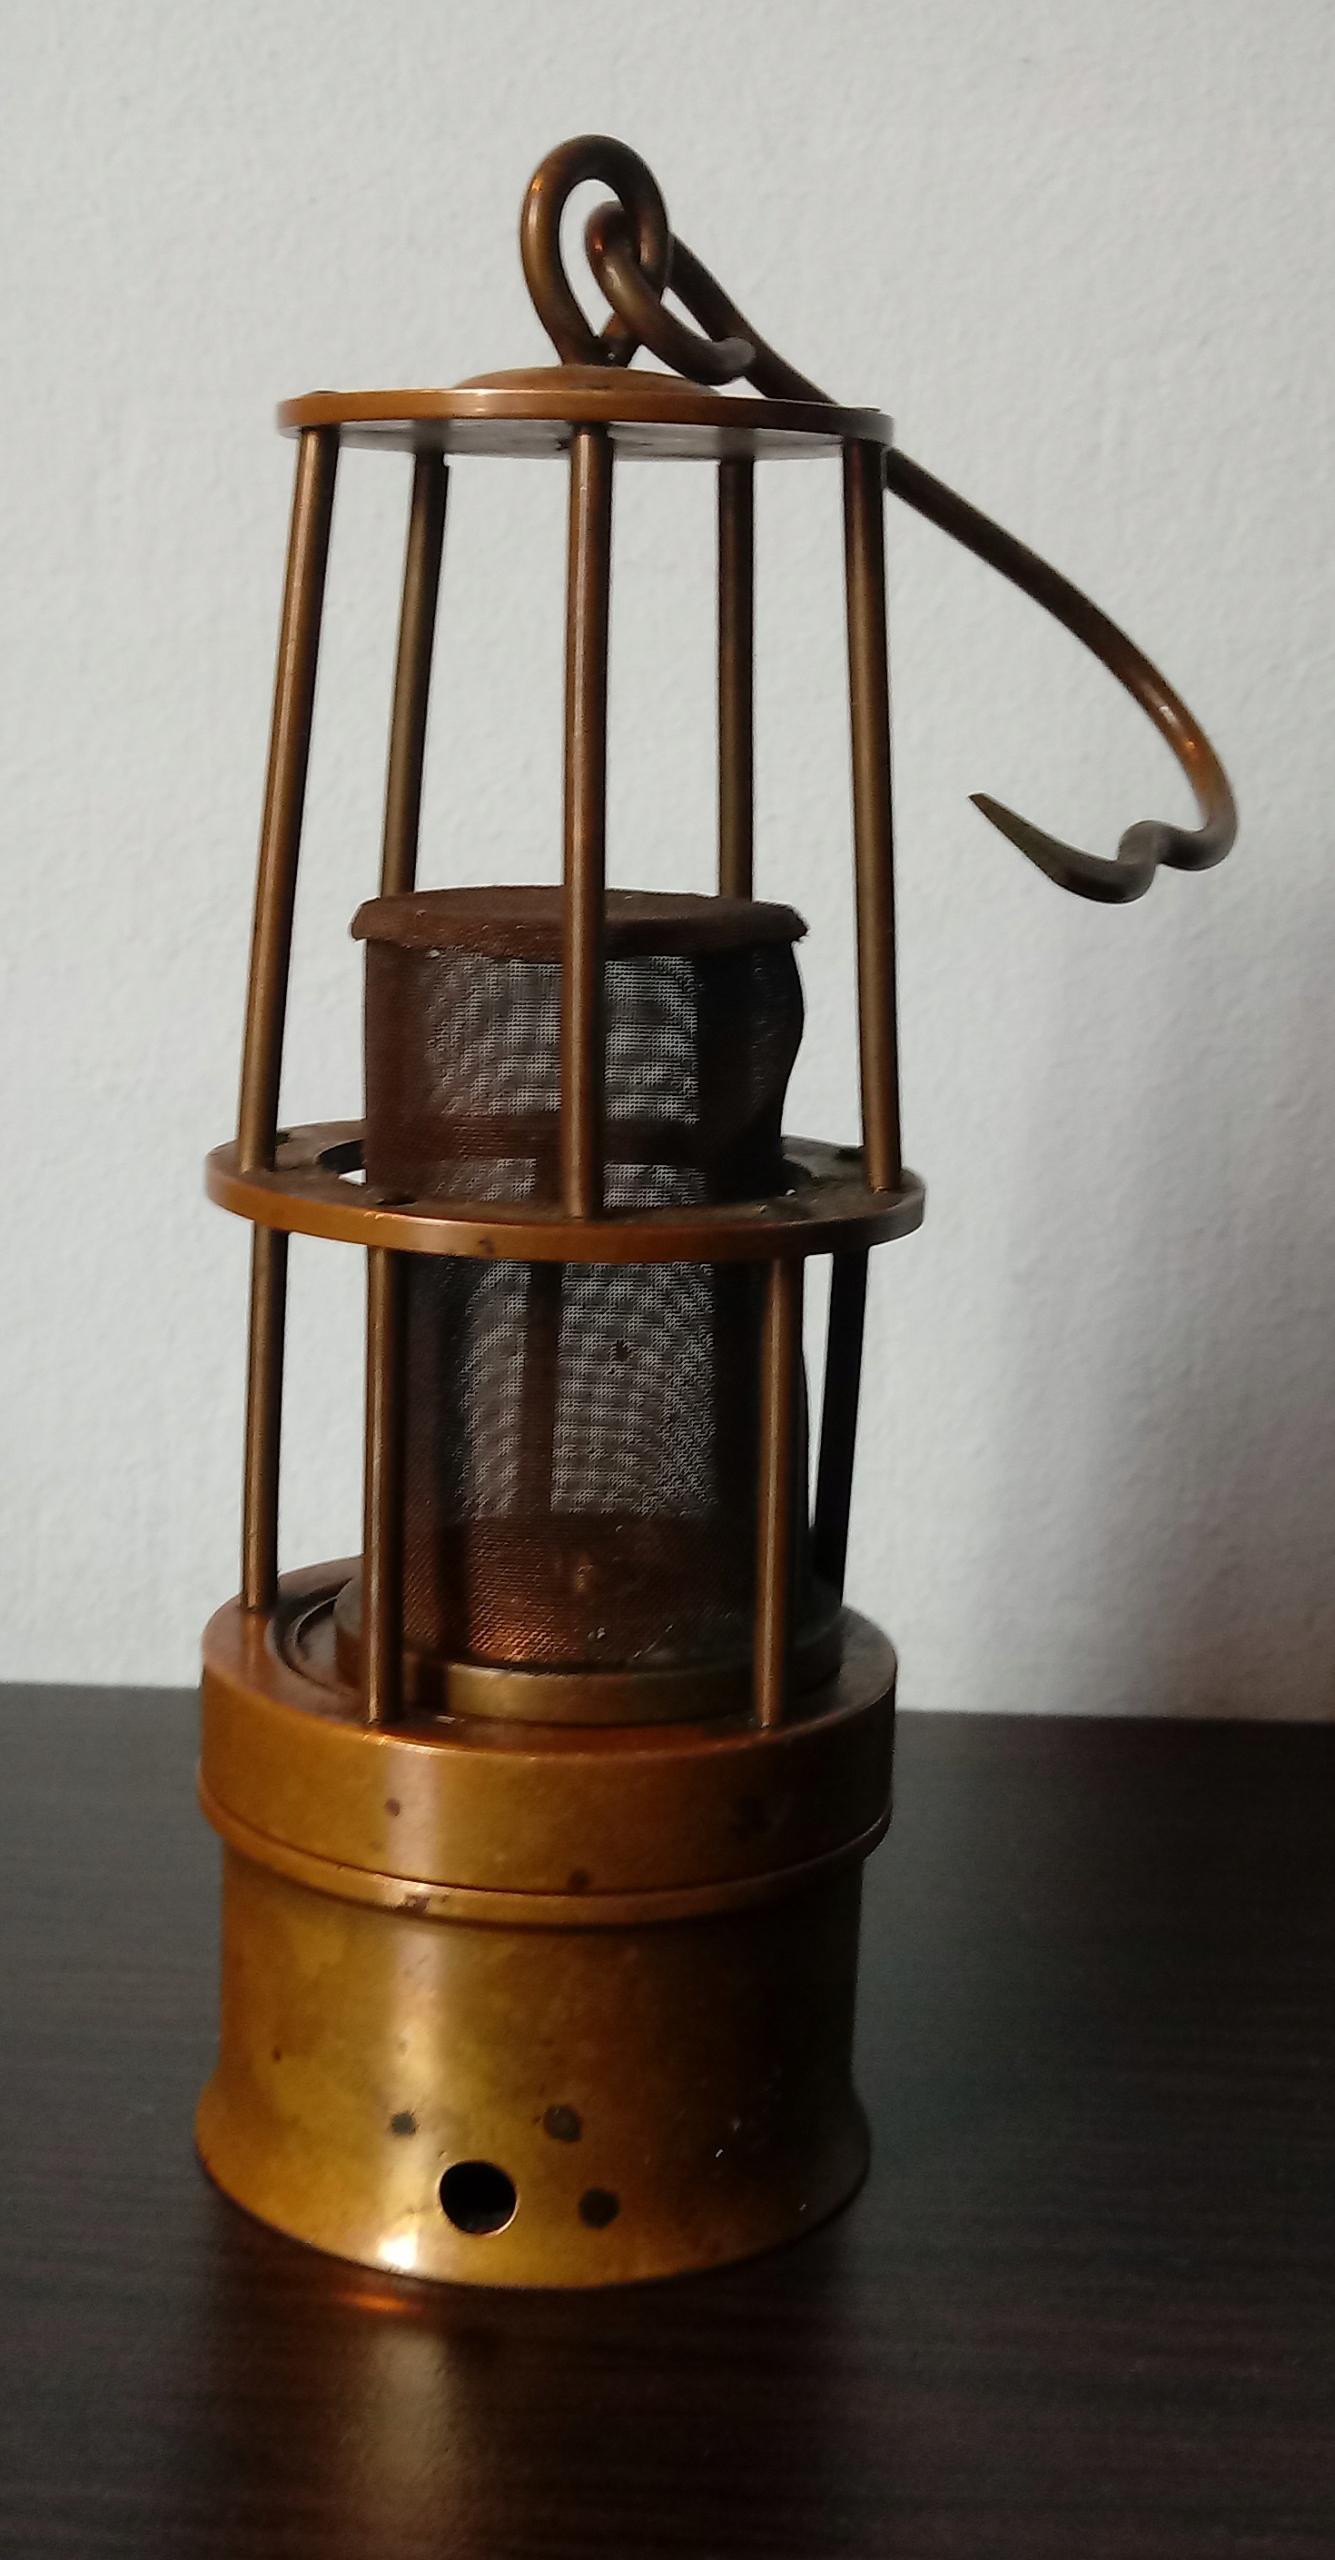 Ozdobna mosiężna miniaturka lampy górniczej